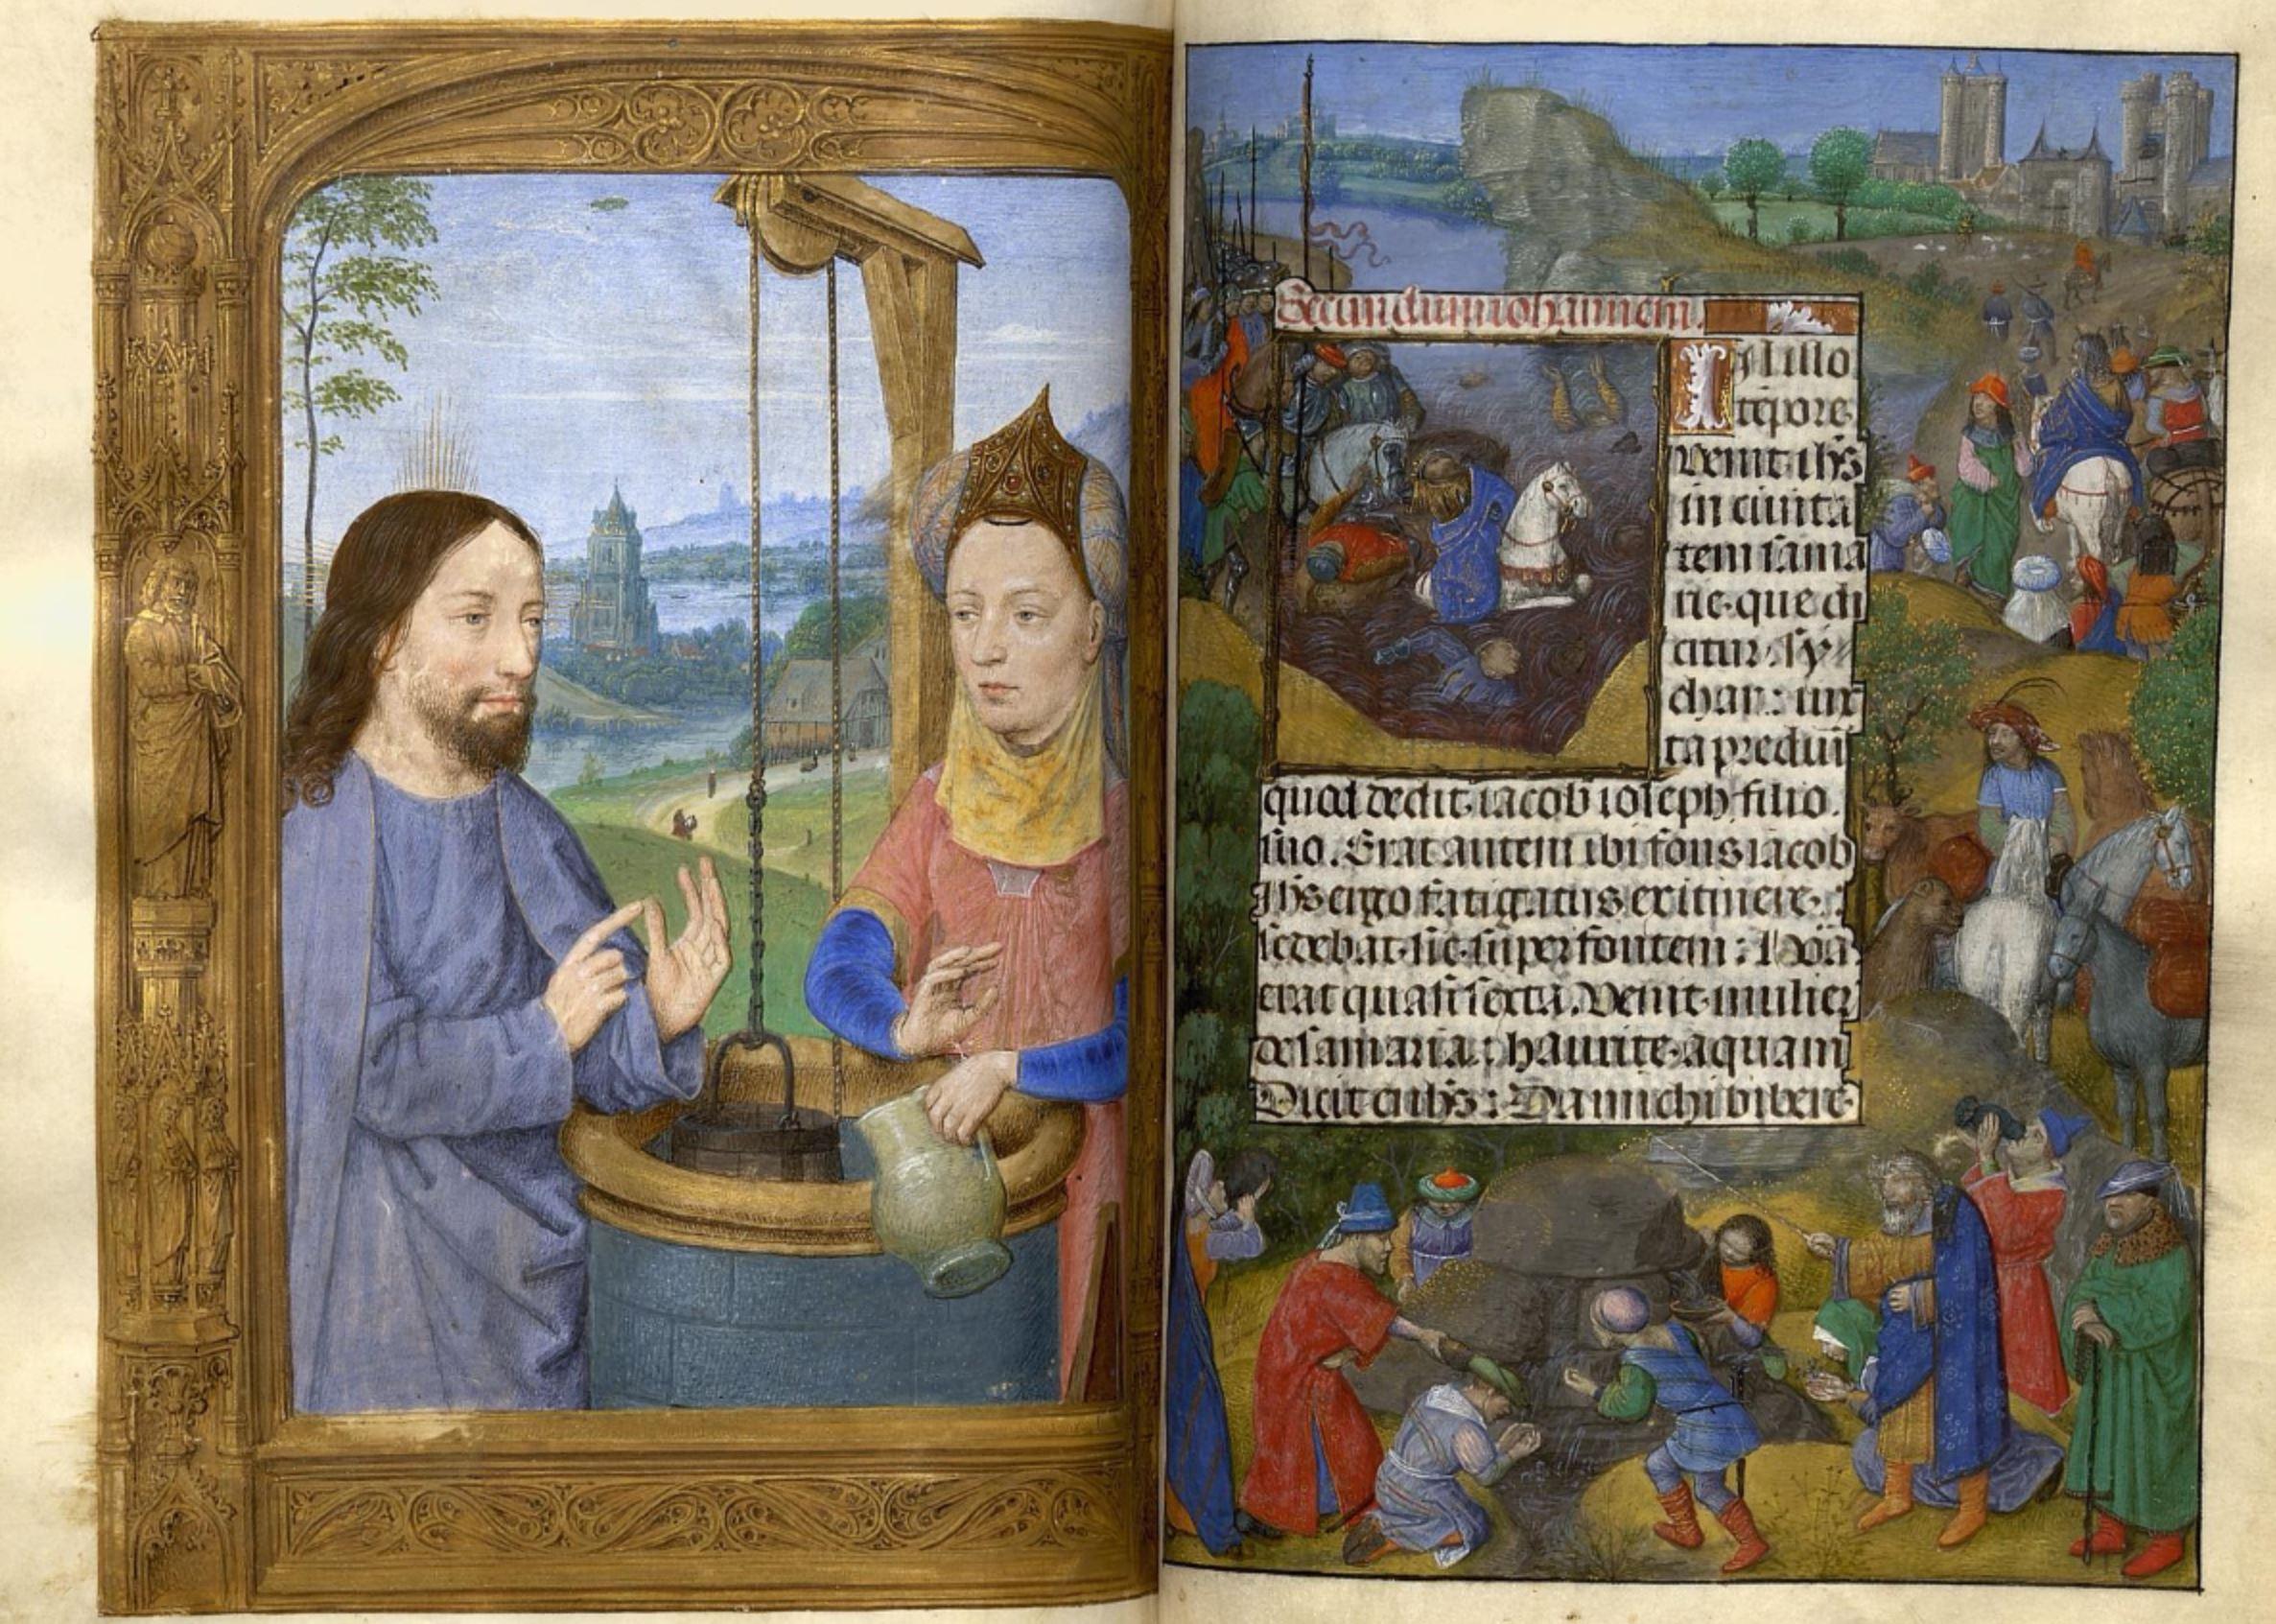 1483-98 Horae Beatae Mariae Virginis (La Flora, pour Charles VIII) Biblioteca nazionale Napoli Ms. I. B. 51 fol 286